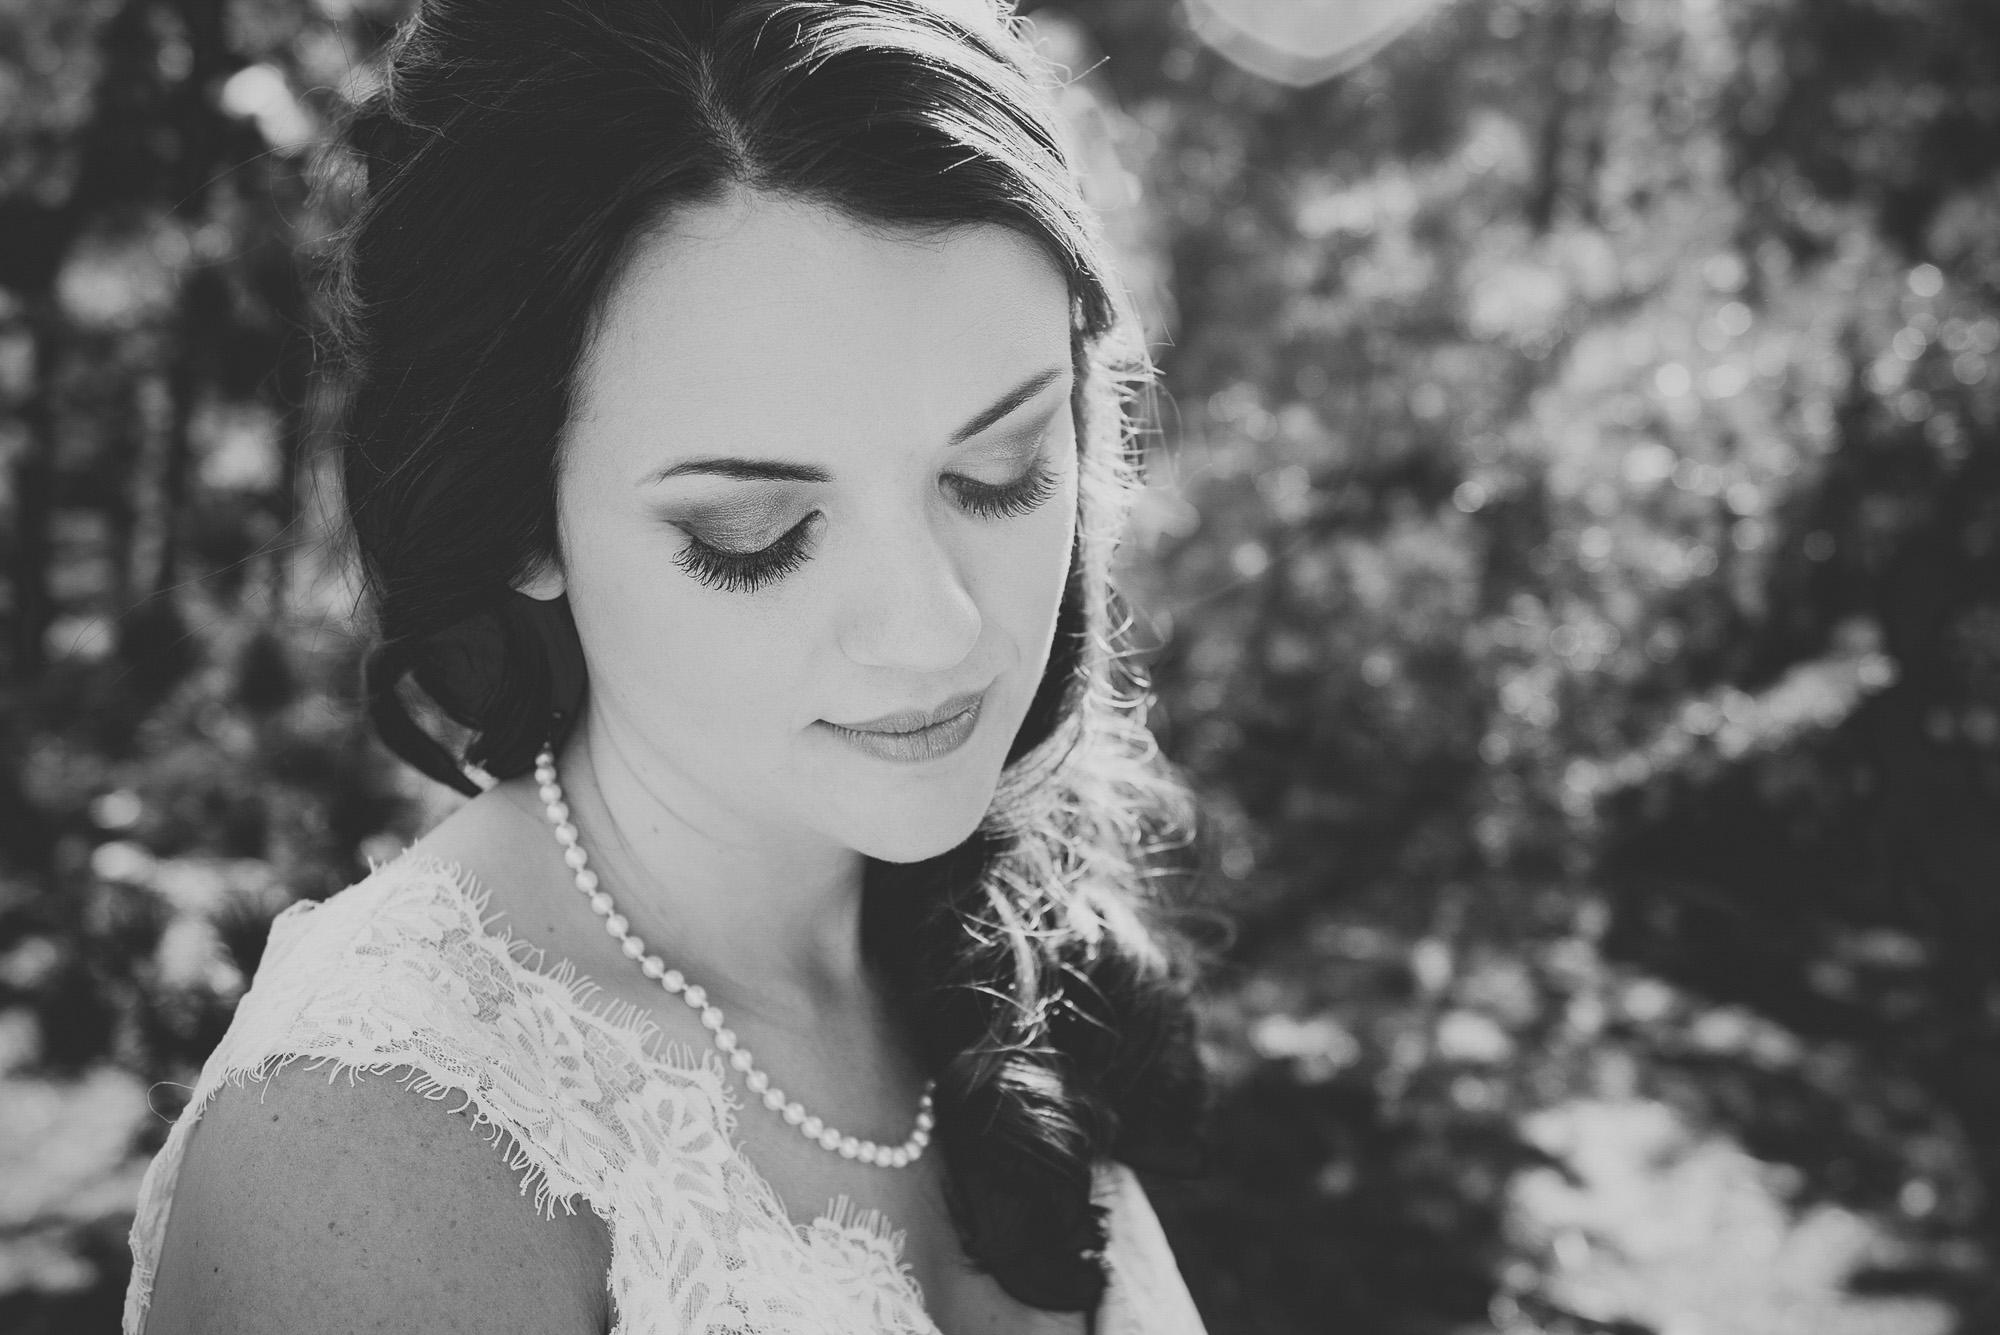 94elopement-photographer-colorado-045snow_mountain_ranch_wedding_colorado_wedding_photographer_kara&jason_0340-2_vintage_black_and_white_film.jpg